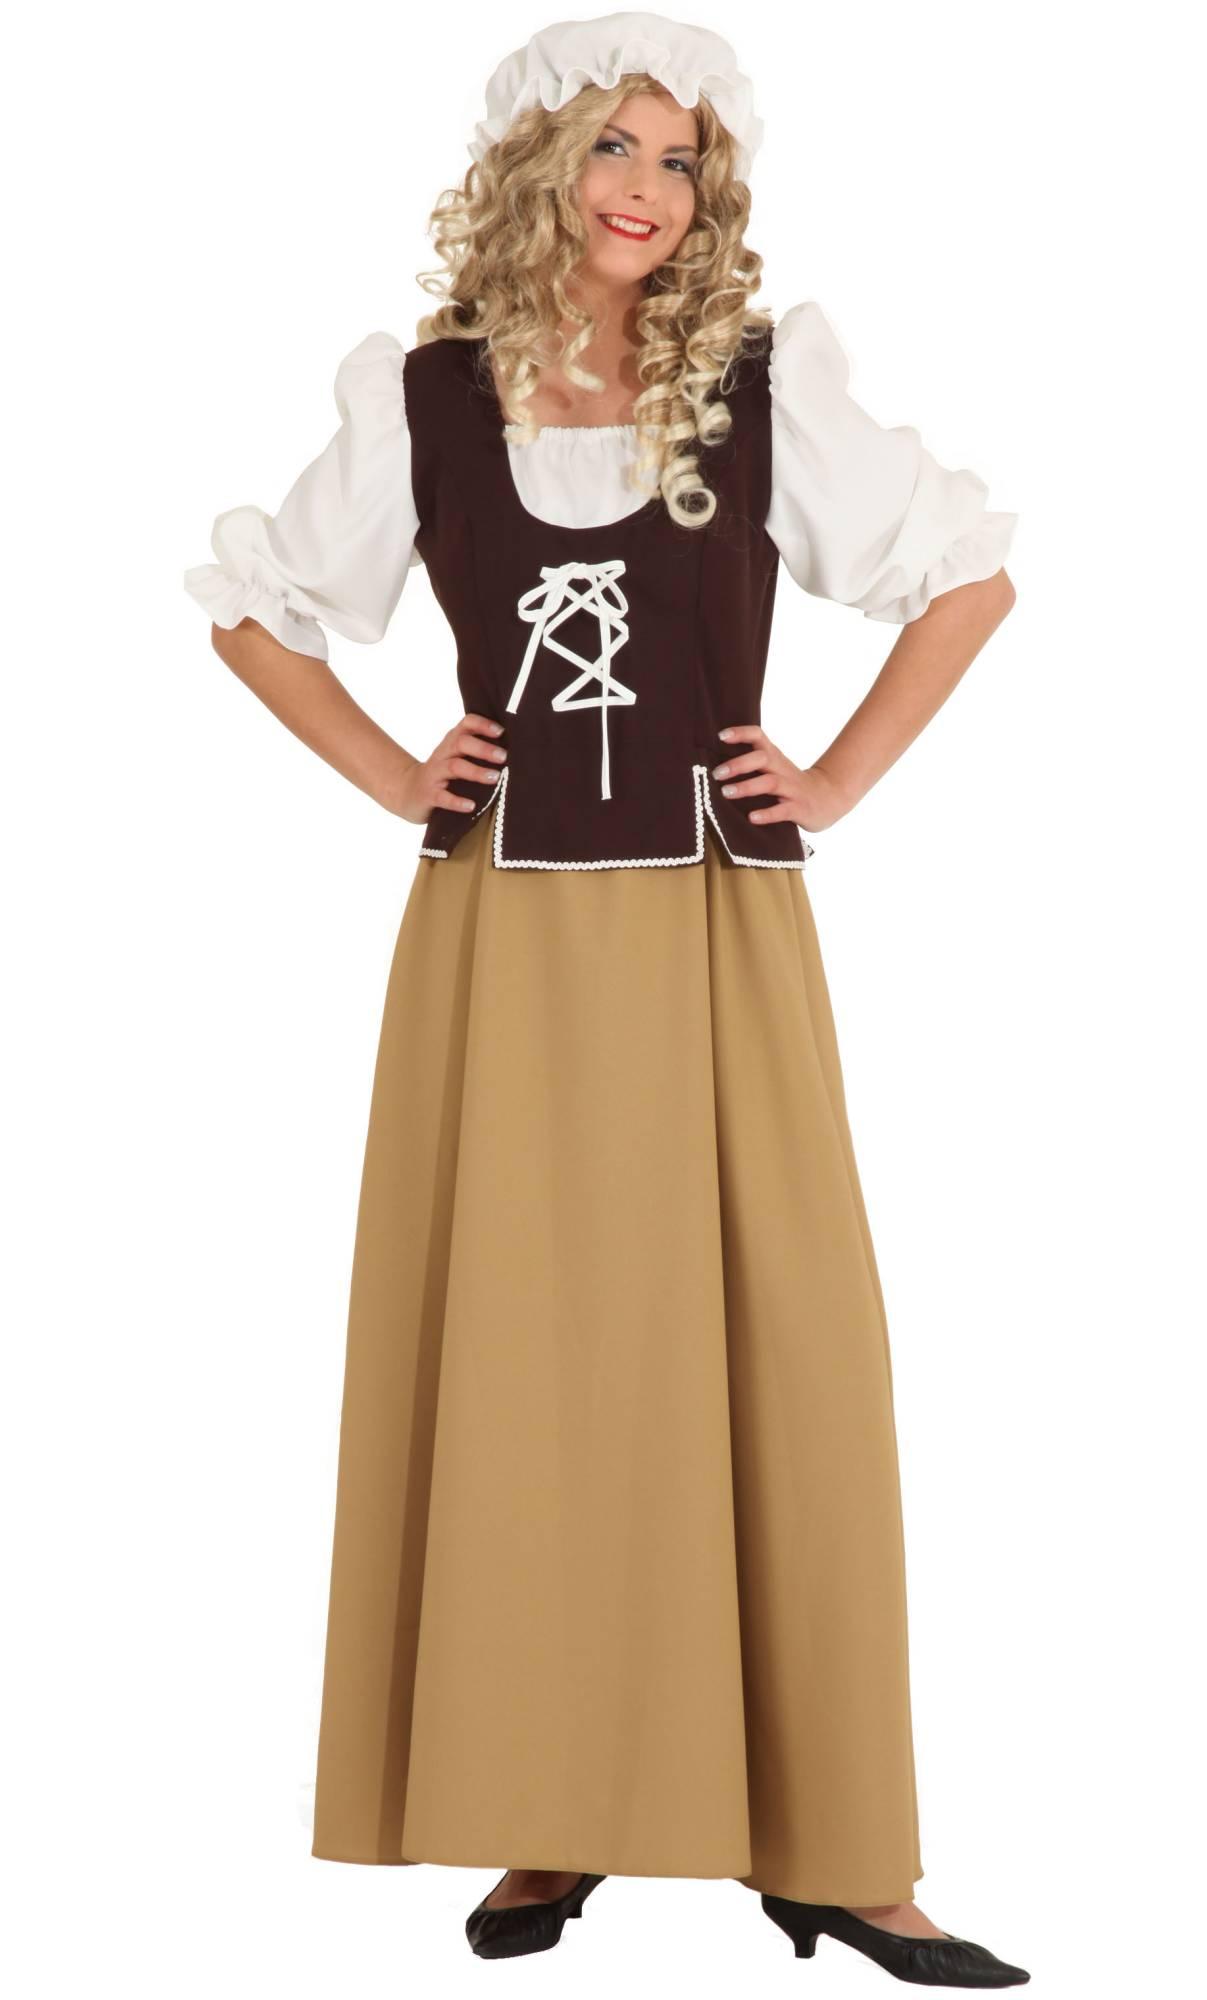 Costume-Médiévale-paysanne